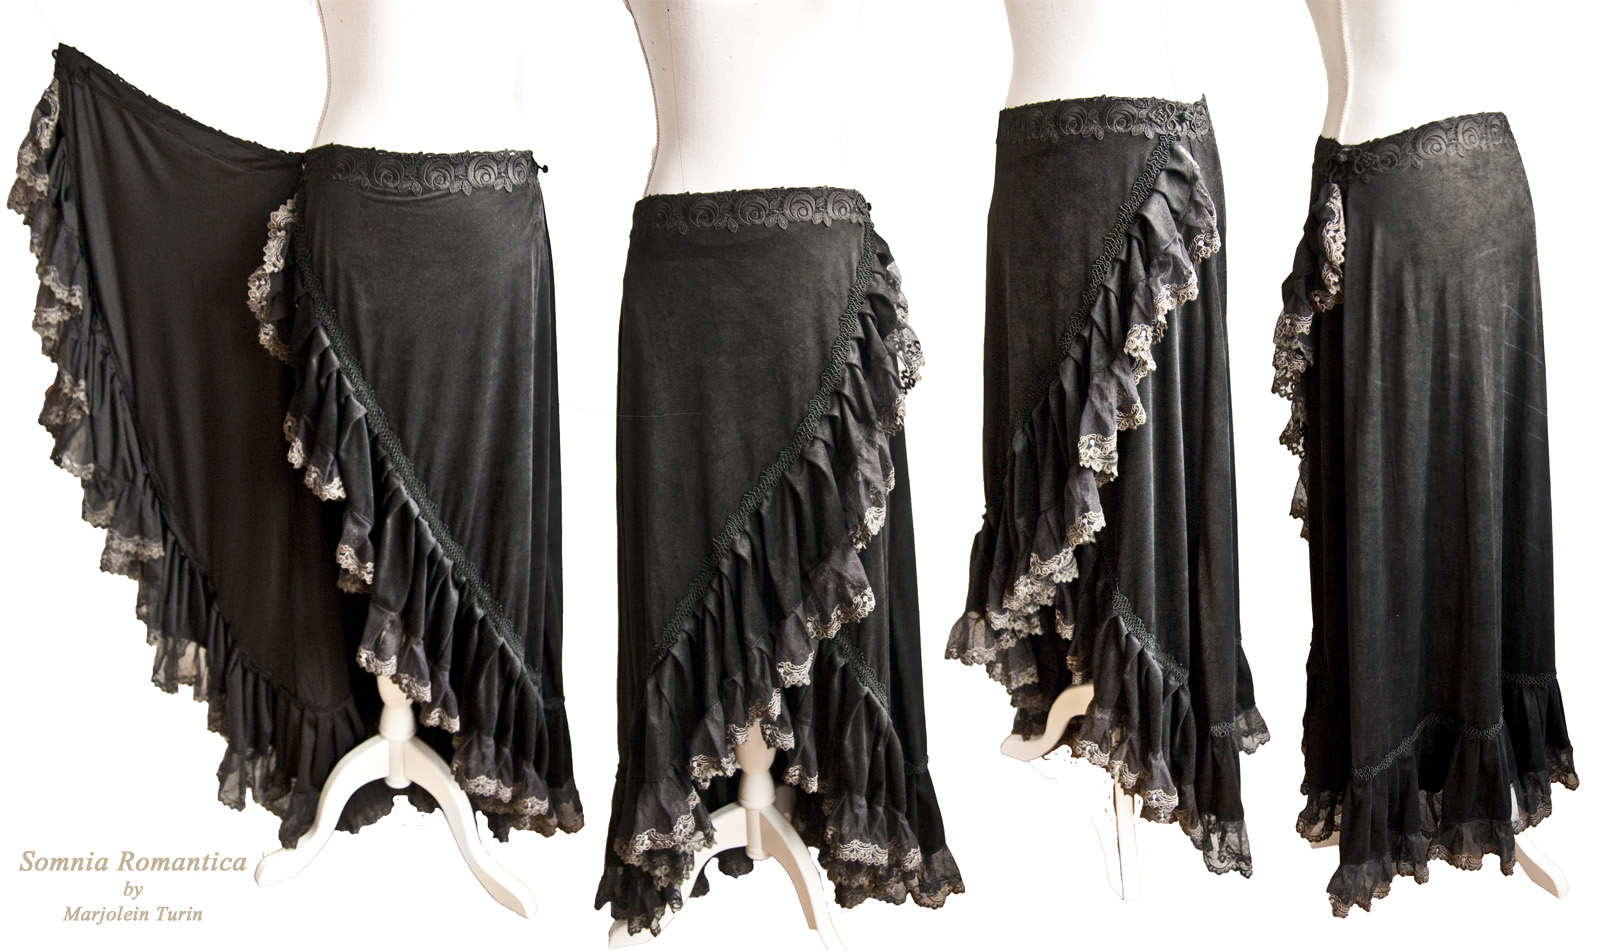 Romantic wrap skirt, Somnia Romantica by M Turin by SomniaRomantica